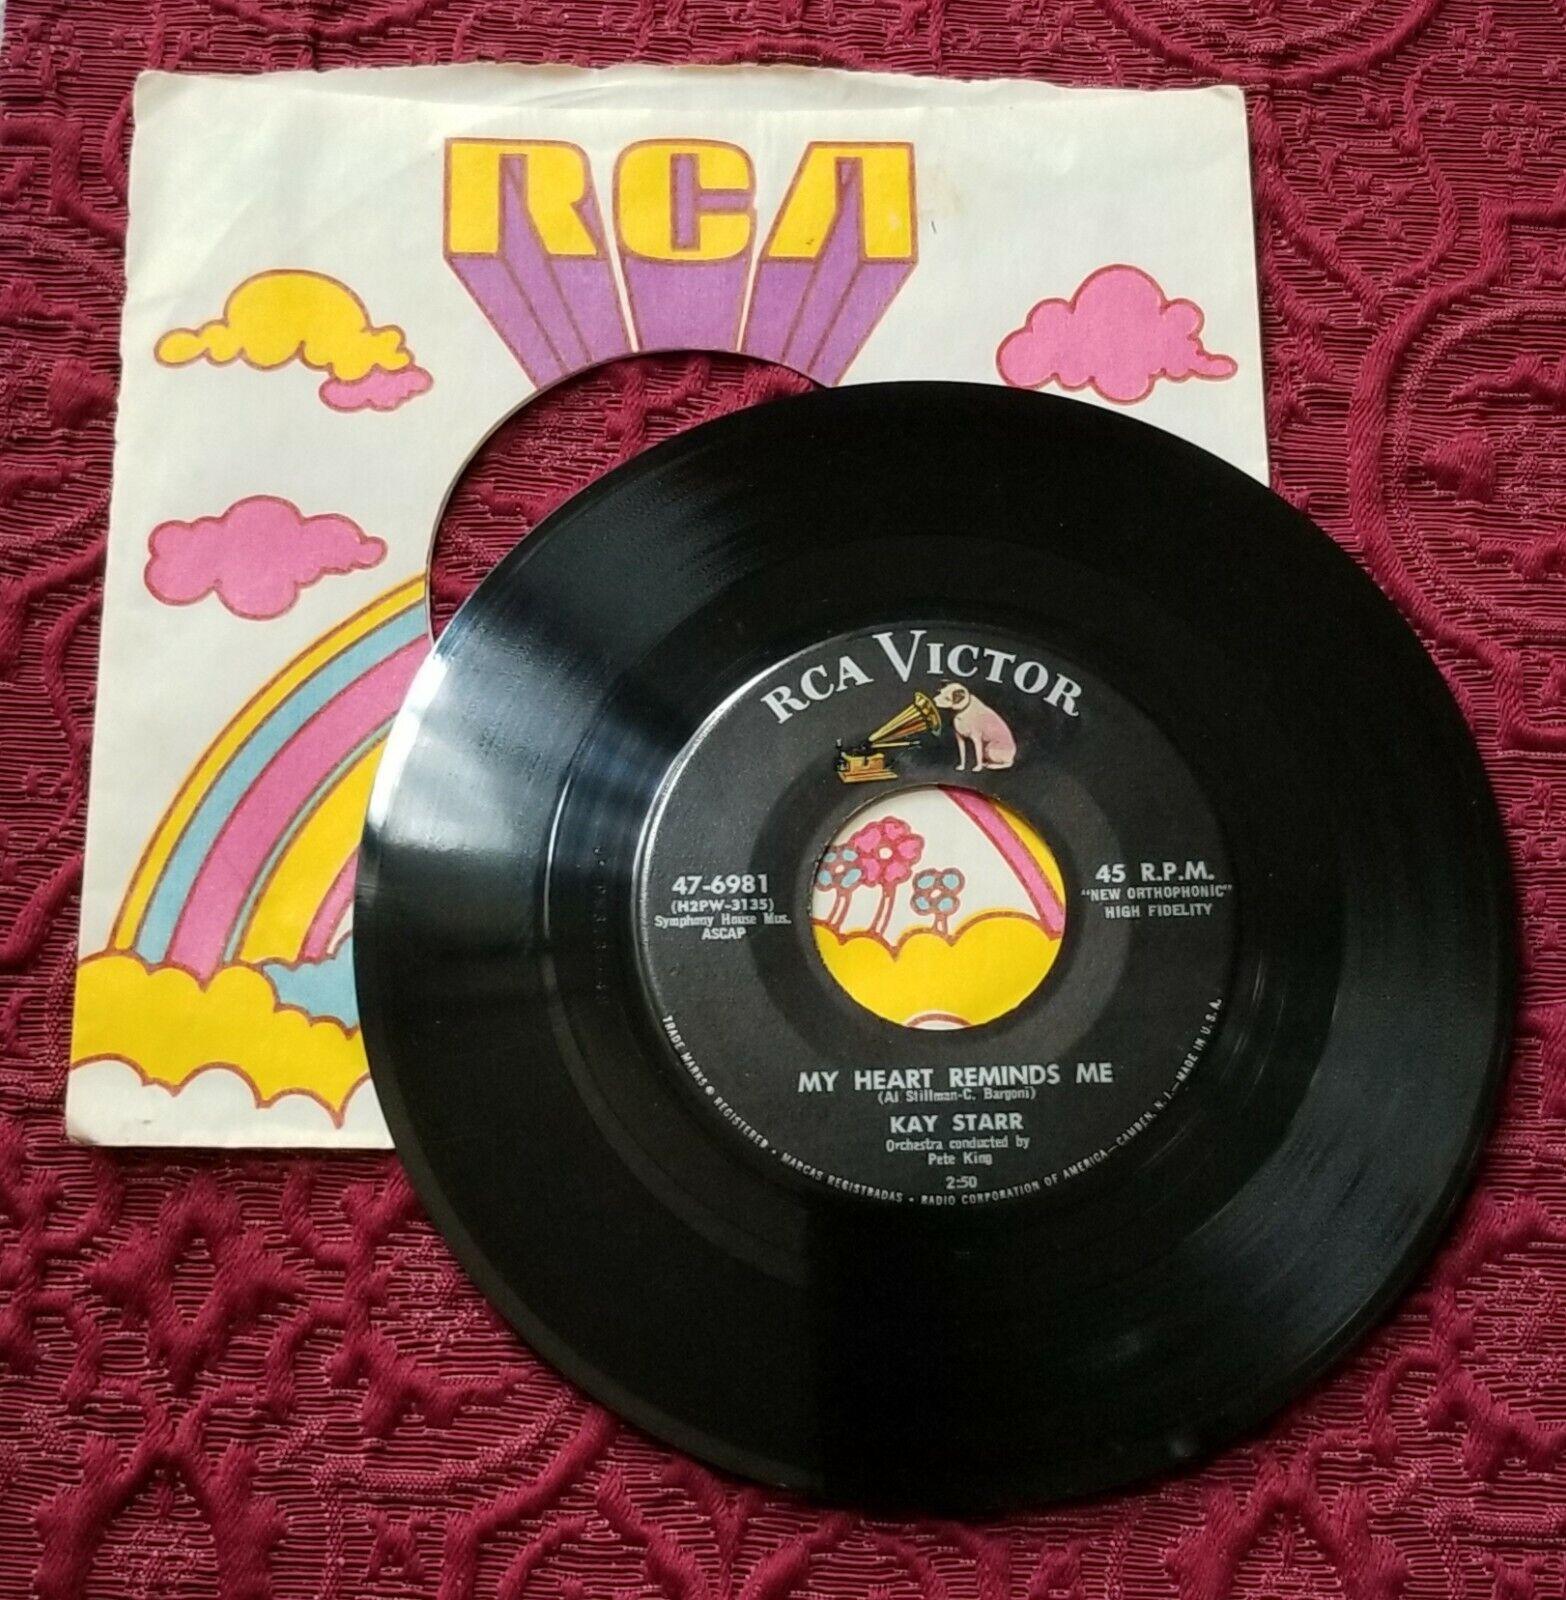 Kay Starr - My Heart Reminds Me / Flim Flam Floo - 45rpm Vinyl Record - $2.50